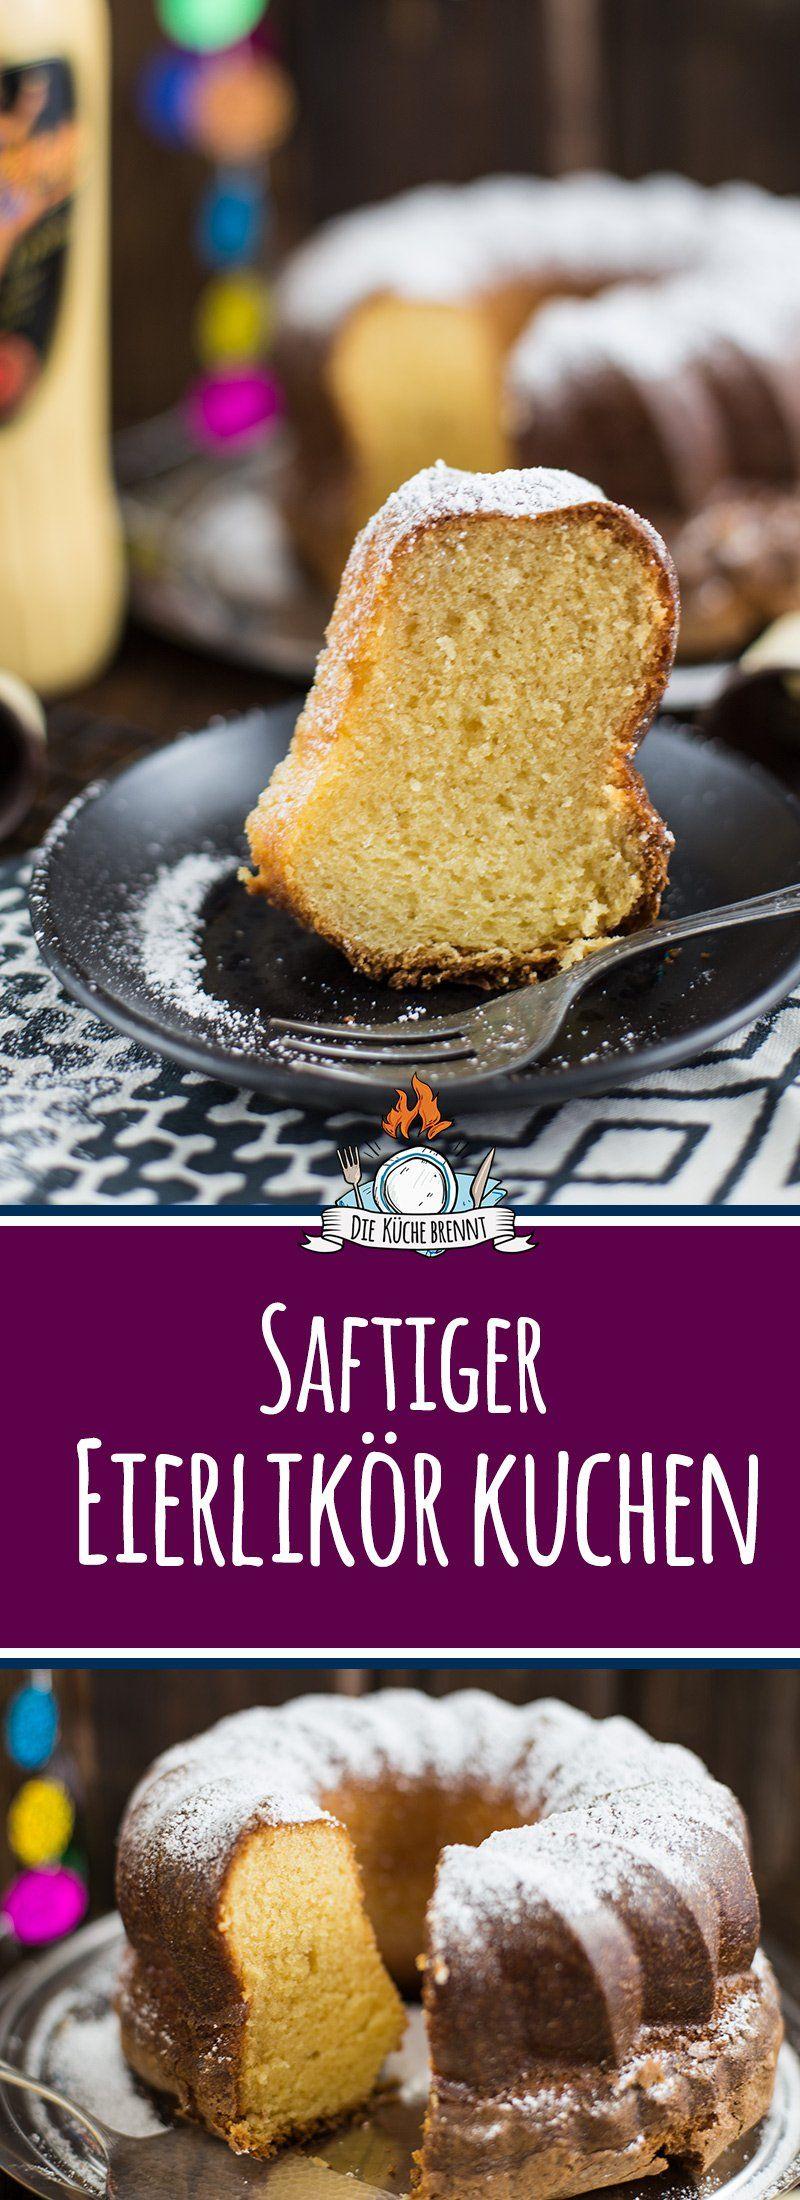 Saftiger Eierlikör Kuchen Rezept - klassische Variante (Rezept ala Oma) |  Rezept | Kuchen rezepte, Kuchen, Backrezepte kuchen